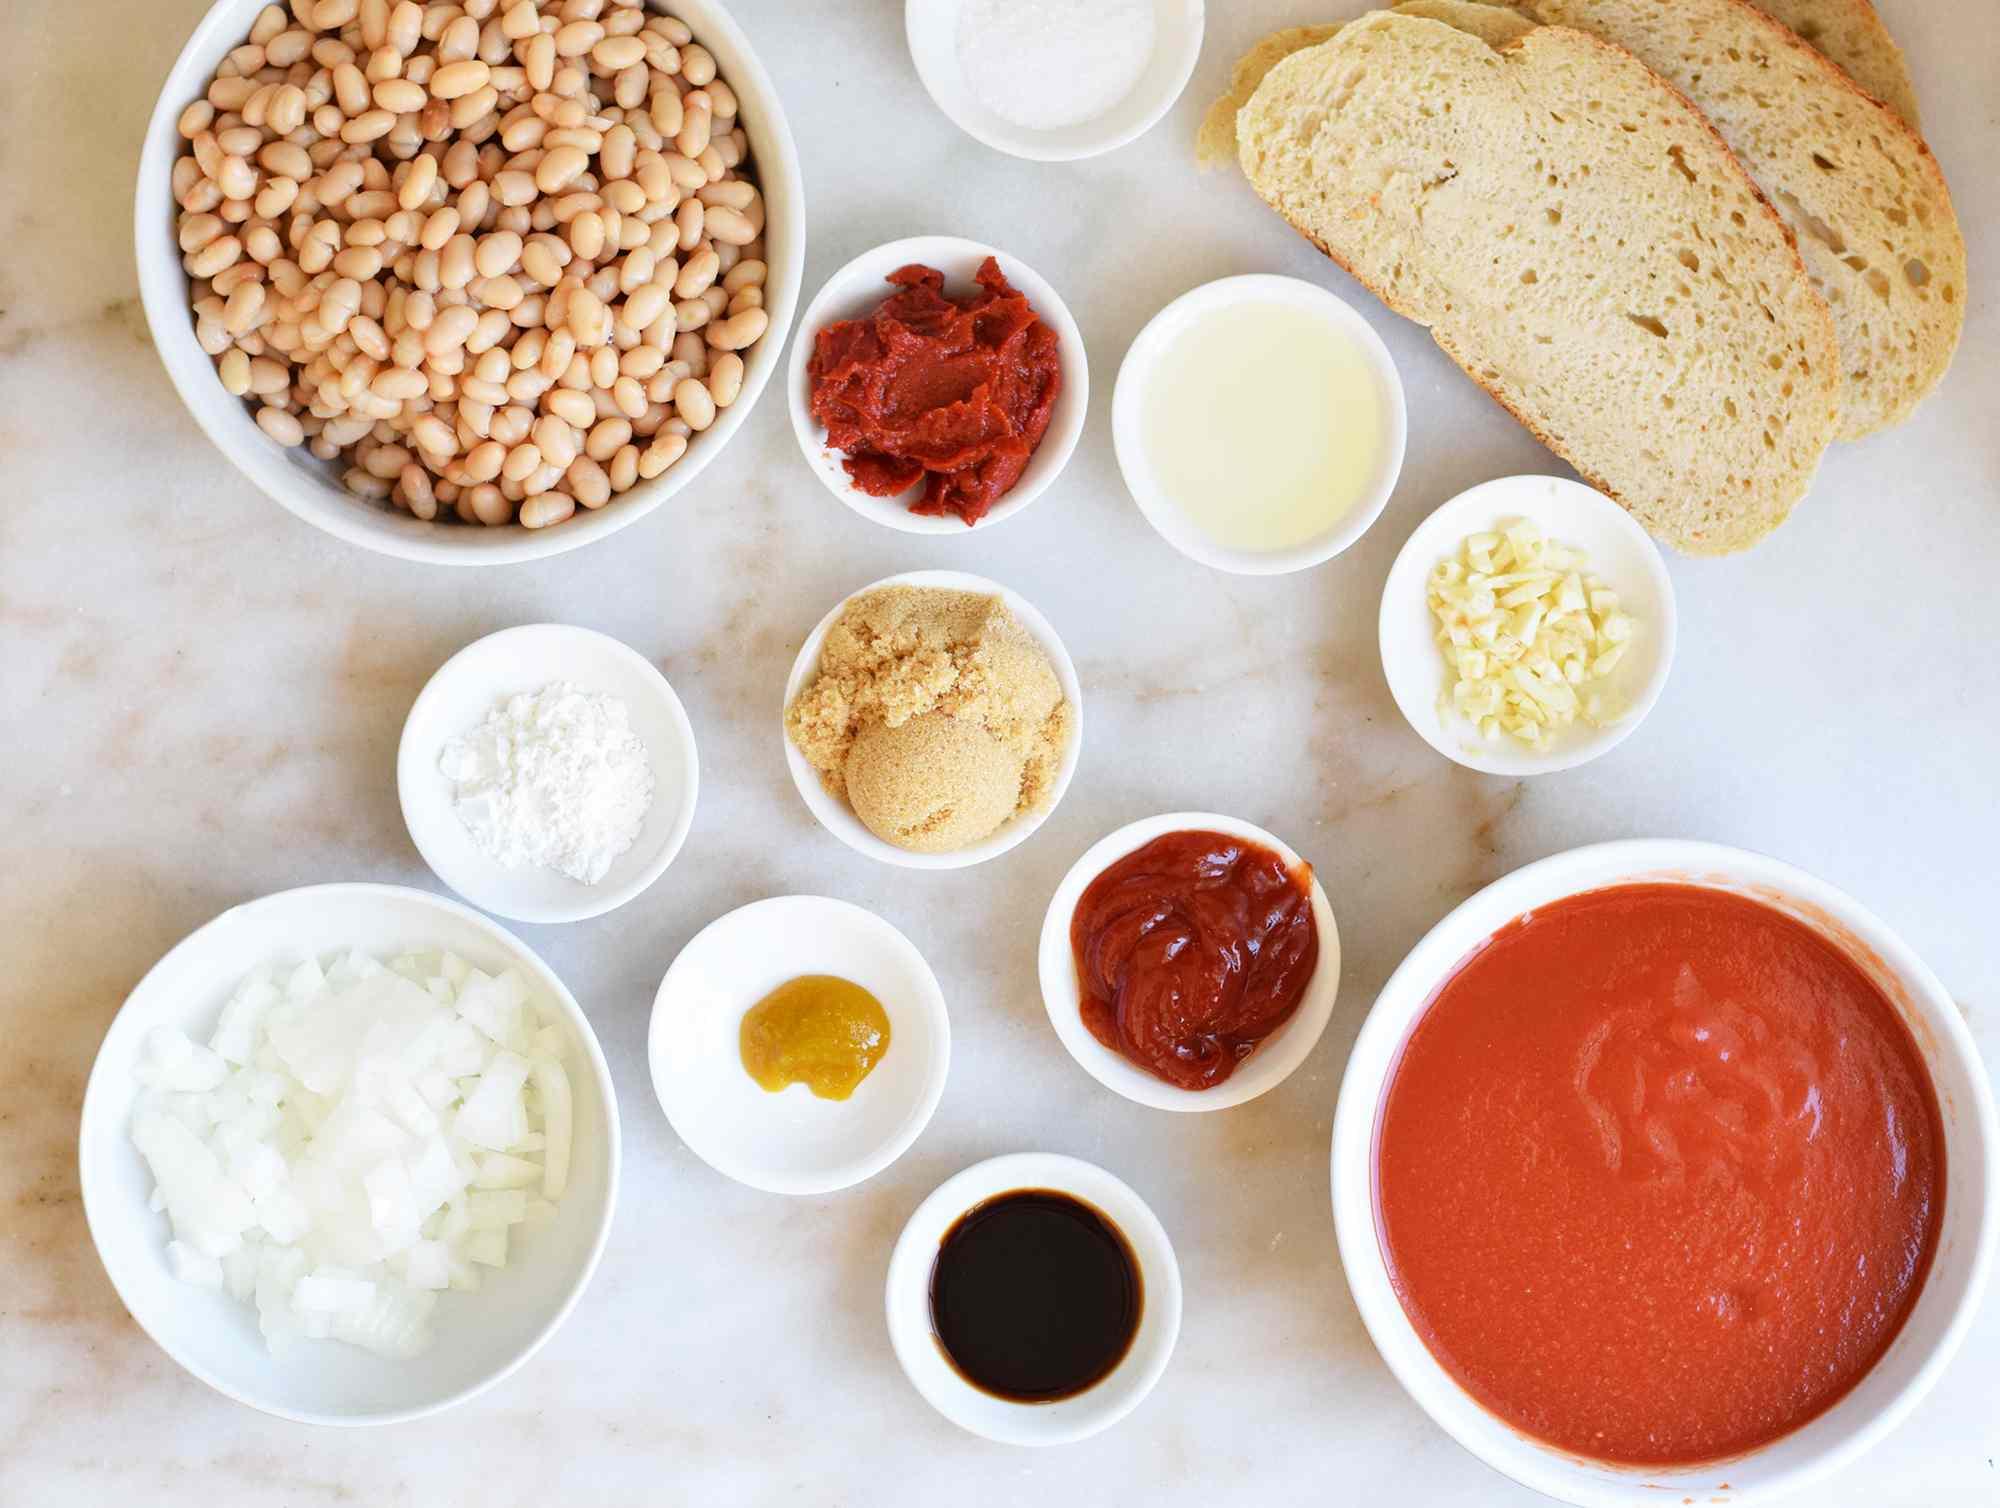 beans on toast ingredients